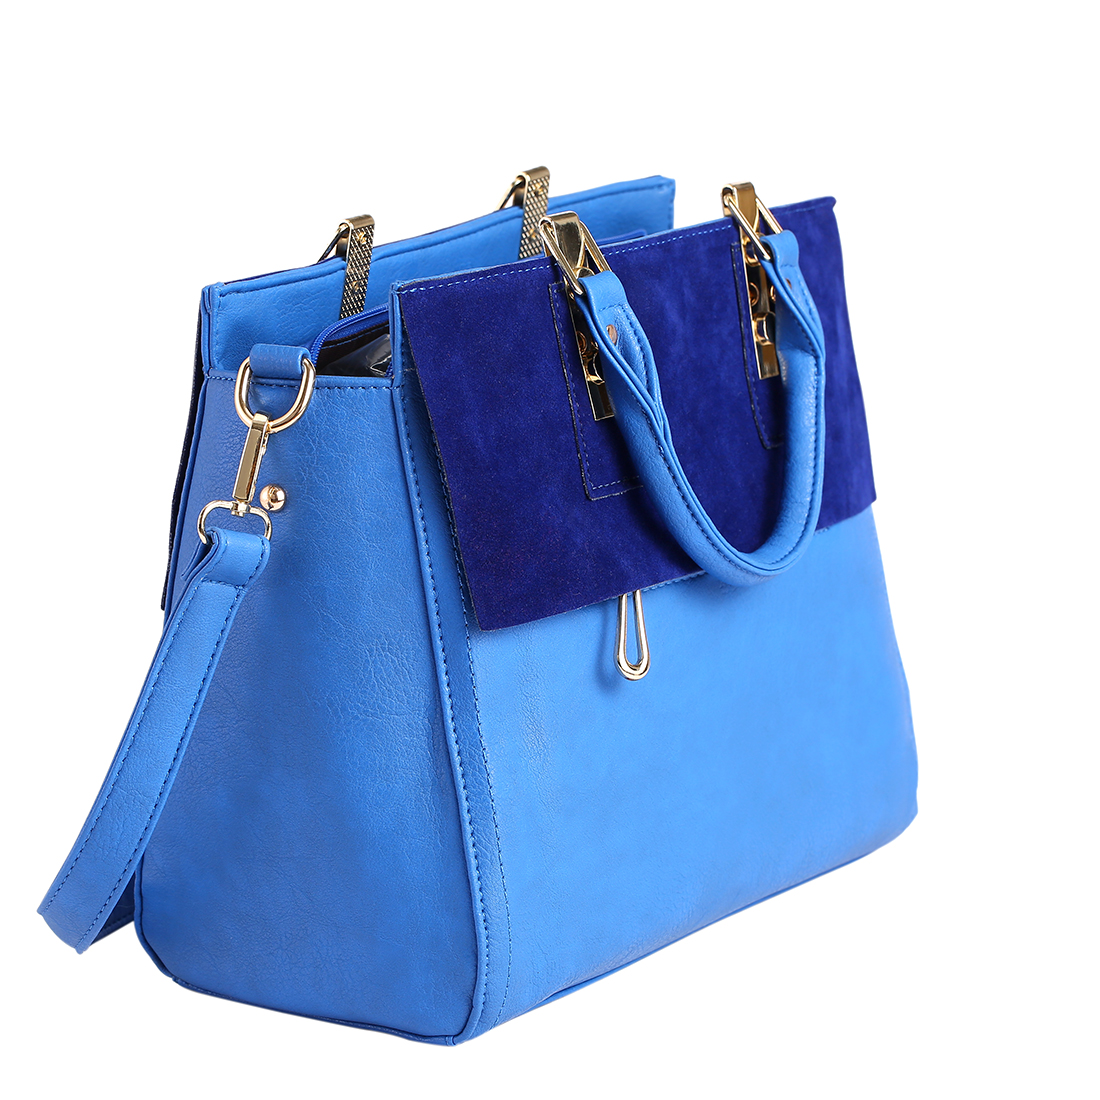 купить Genuine Leather Women Handbag Frosted Vintage tote bags Women Messenger Bags Handbags Women Famous Brands Satchels Hot Sale по цене 2527.47 рублей